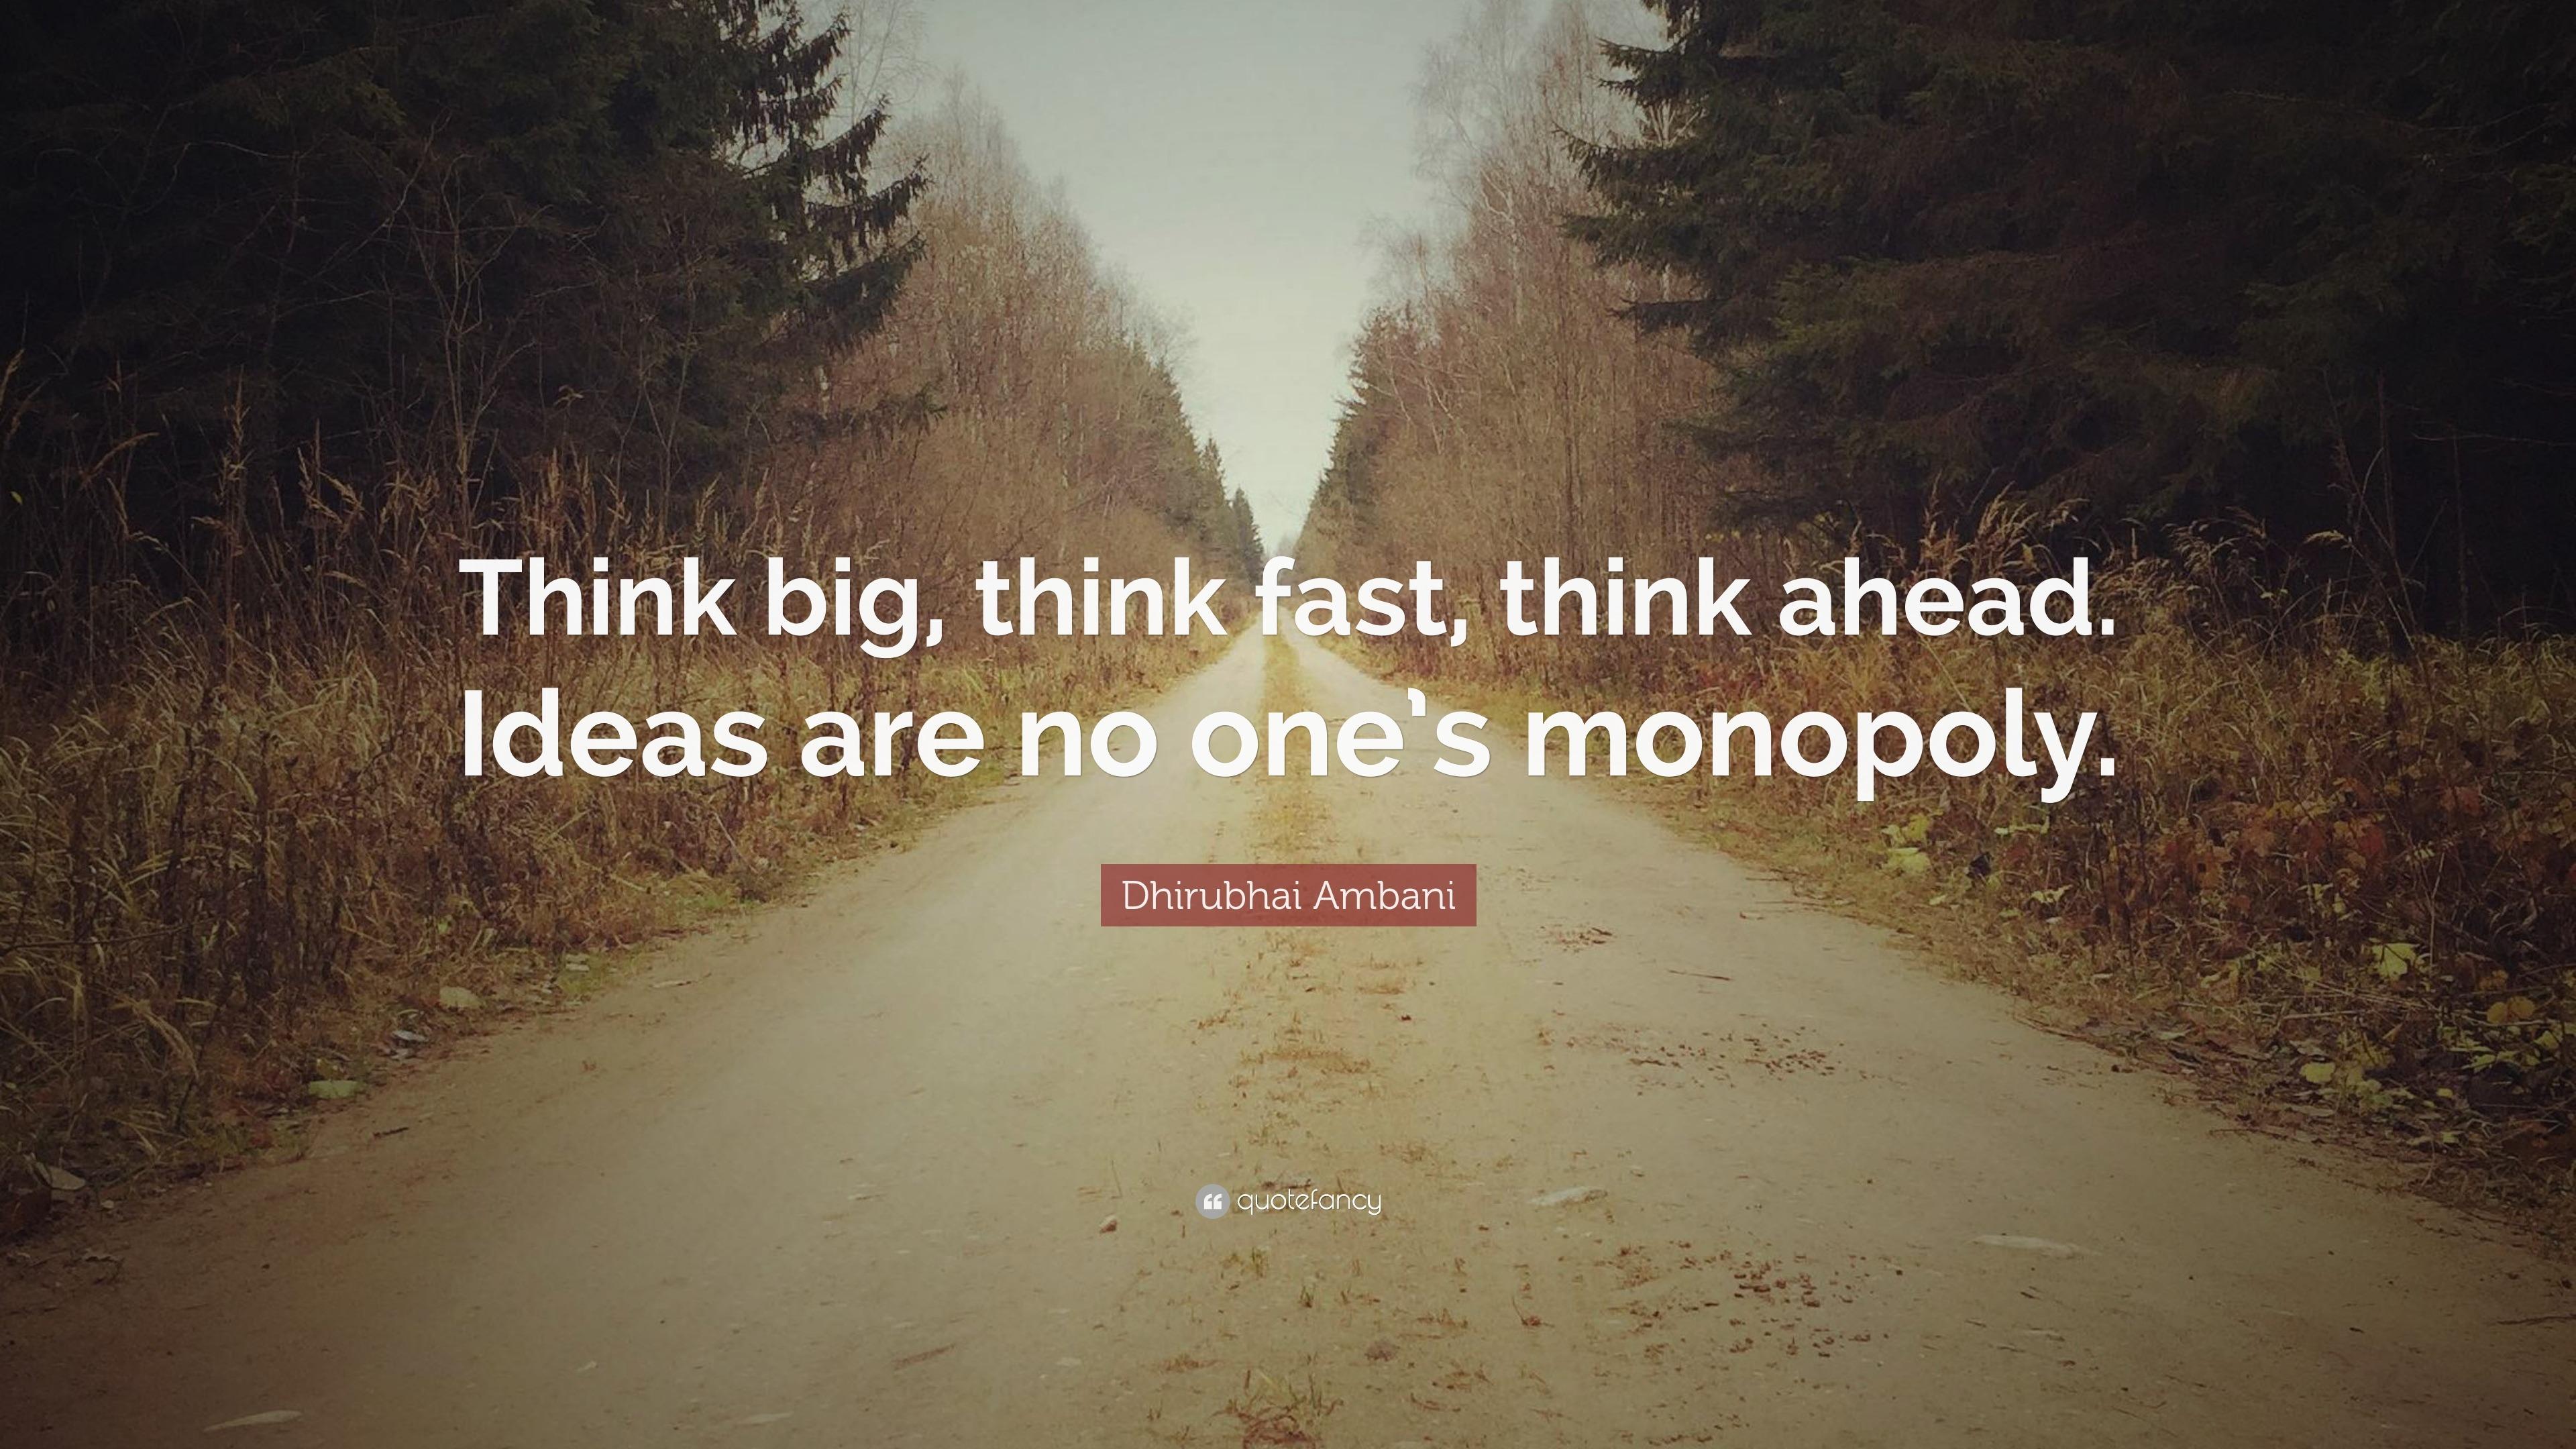 Steve Jobs Motivational Quotes Wallpaper Dhirubhai Ambani Quote Think Big Think Fast Think